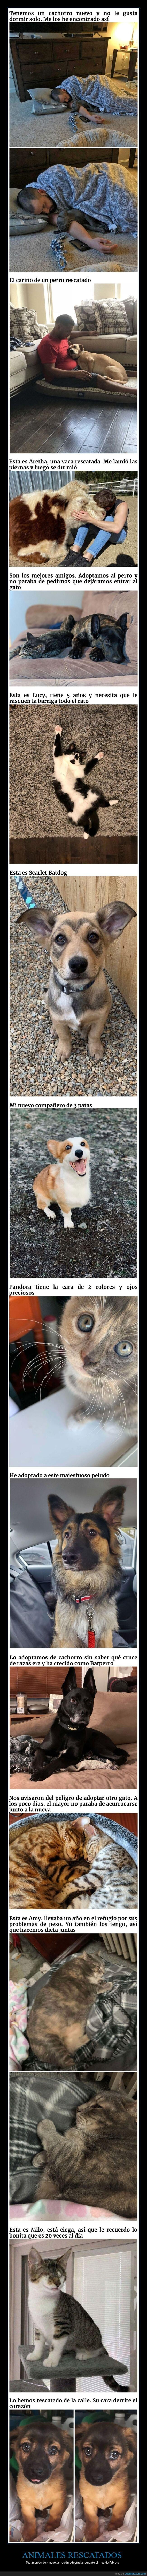 adoptados,animales,mascotas